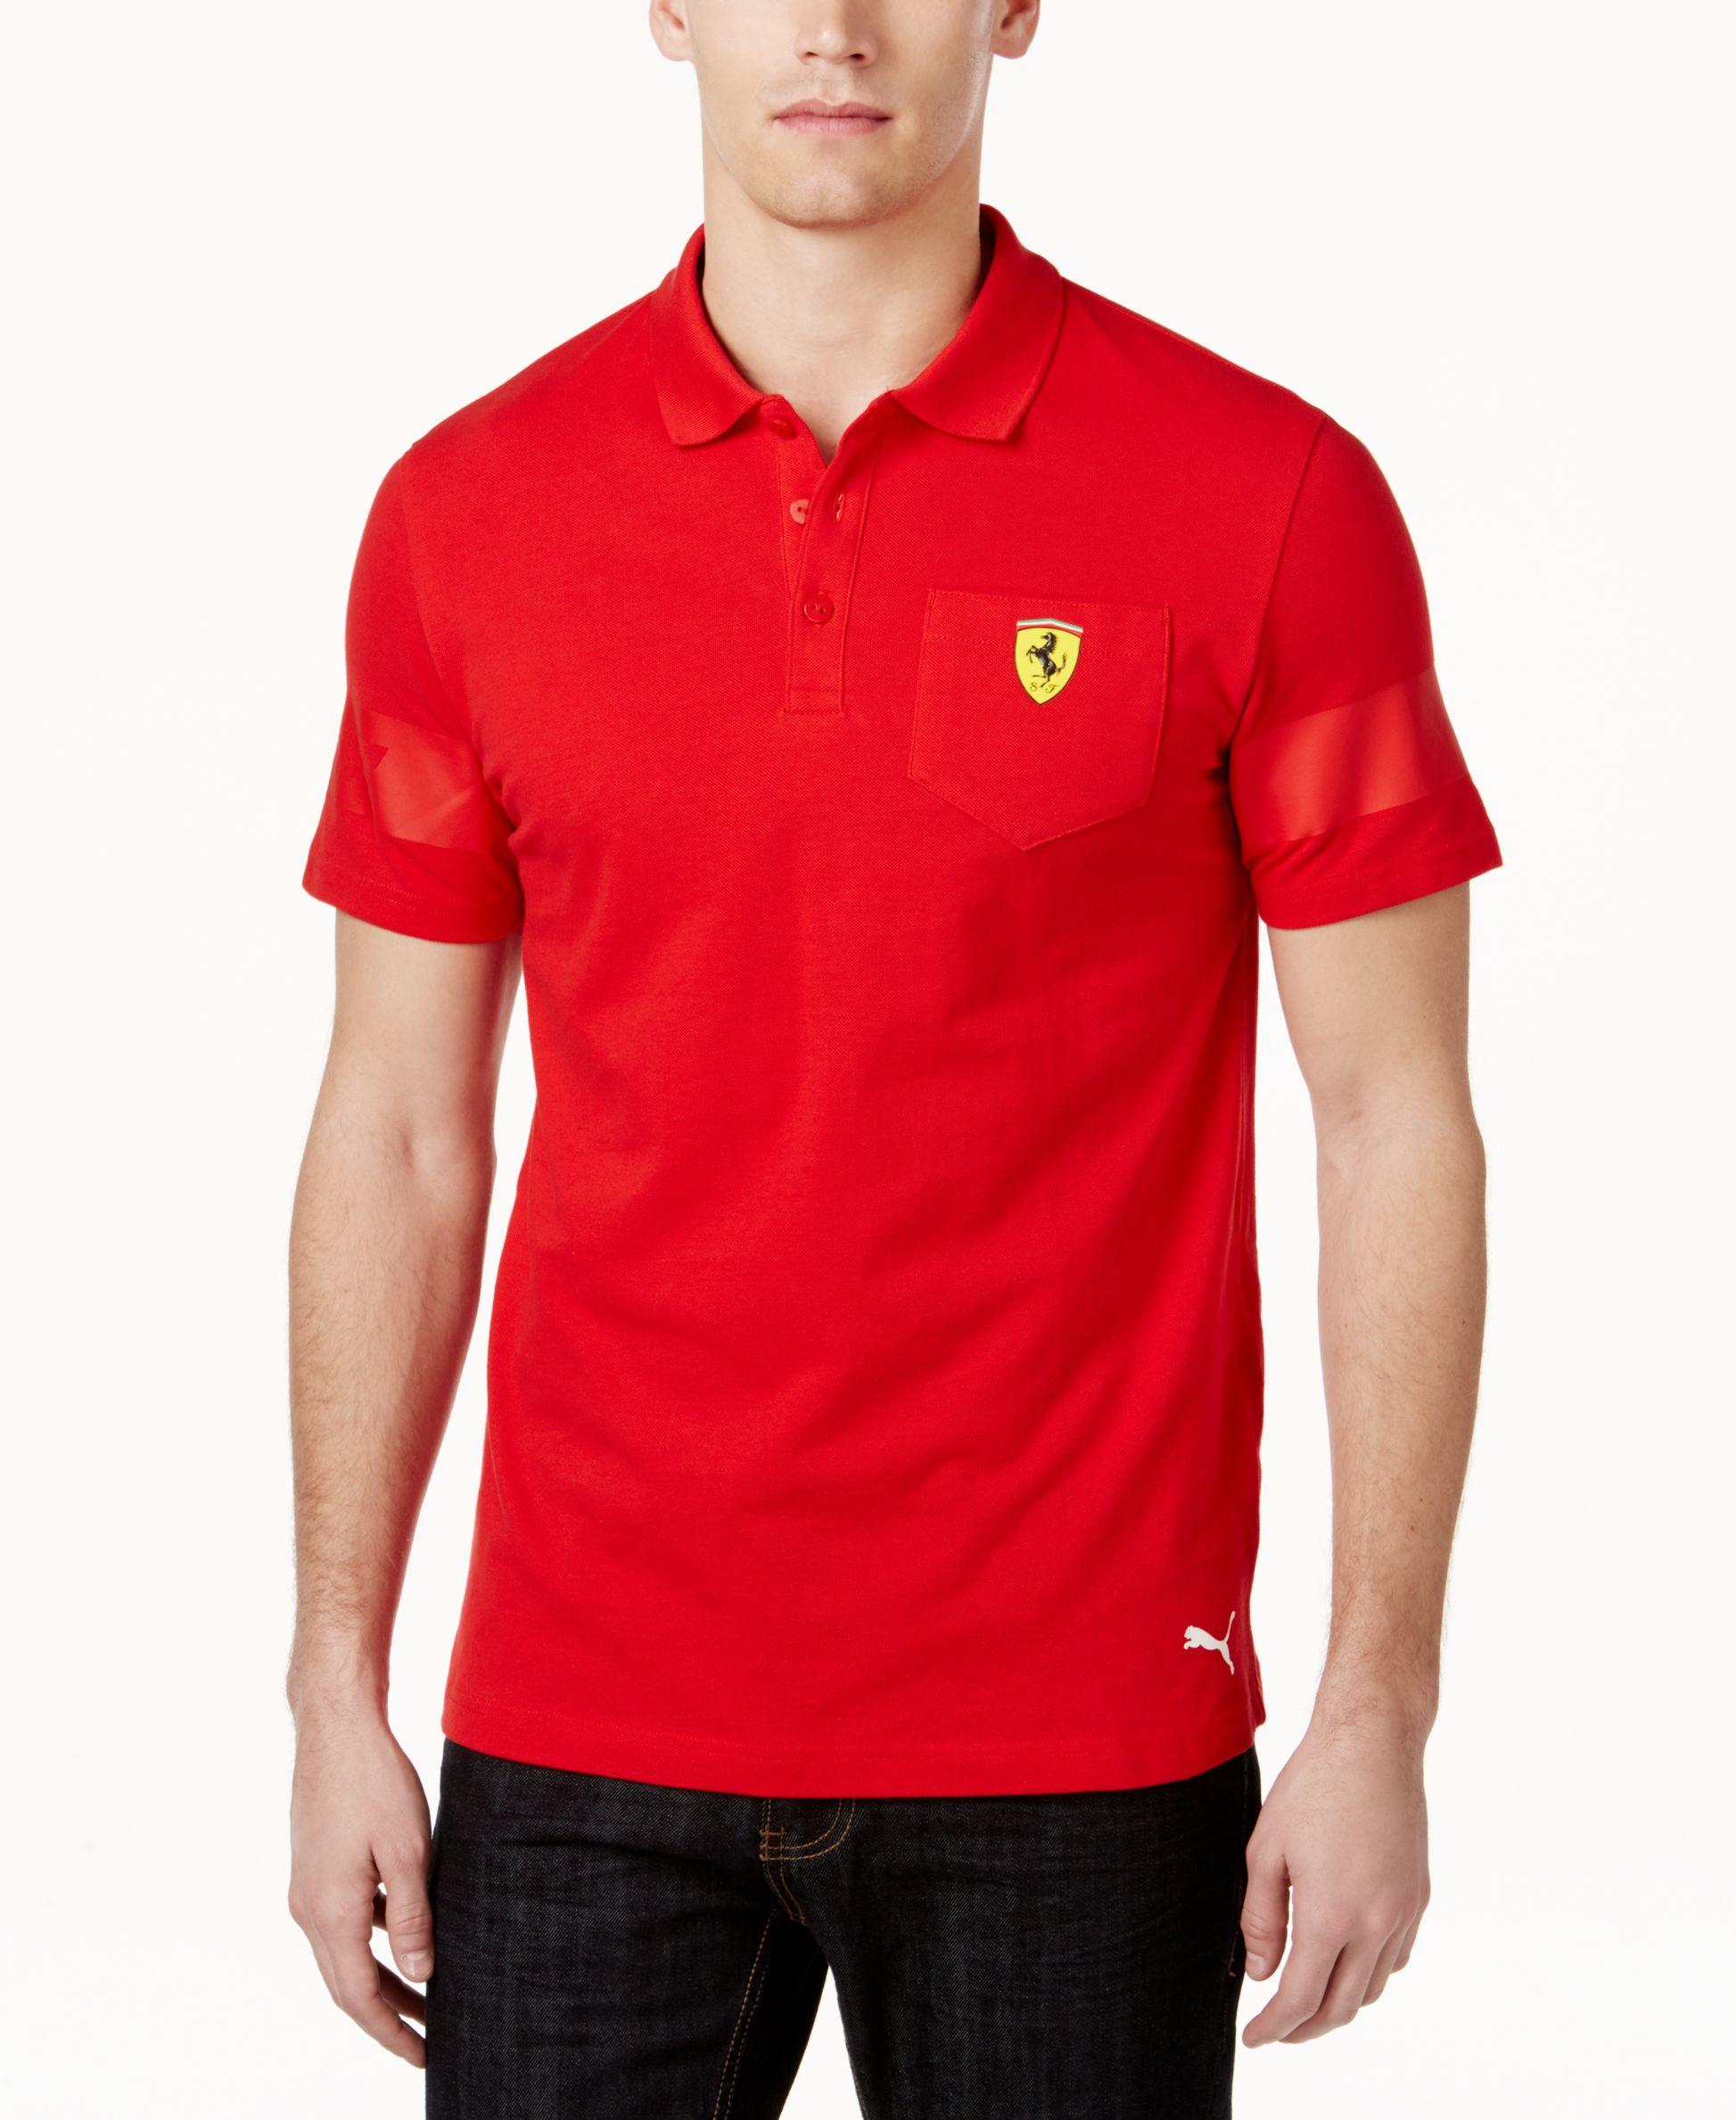 india polo leshirt shirts buy puma red asp ferrari off shirt t